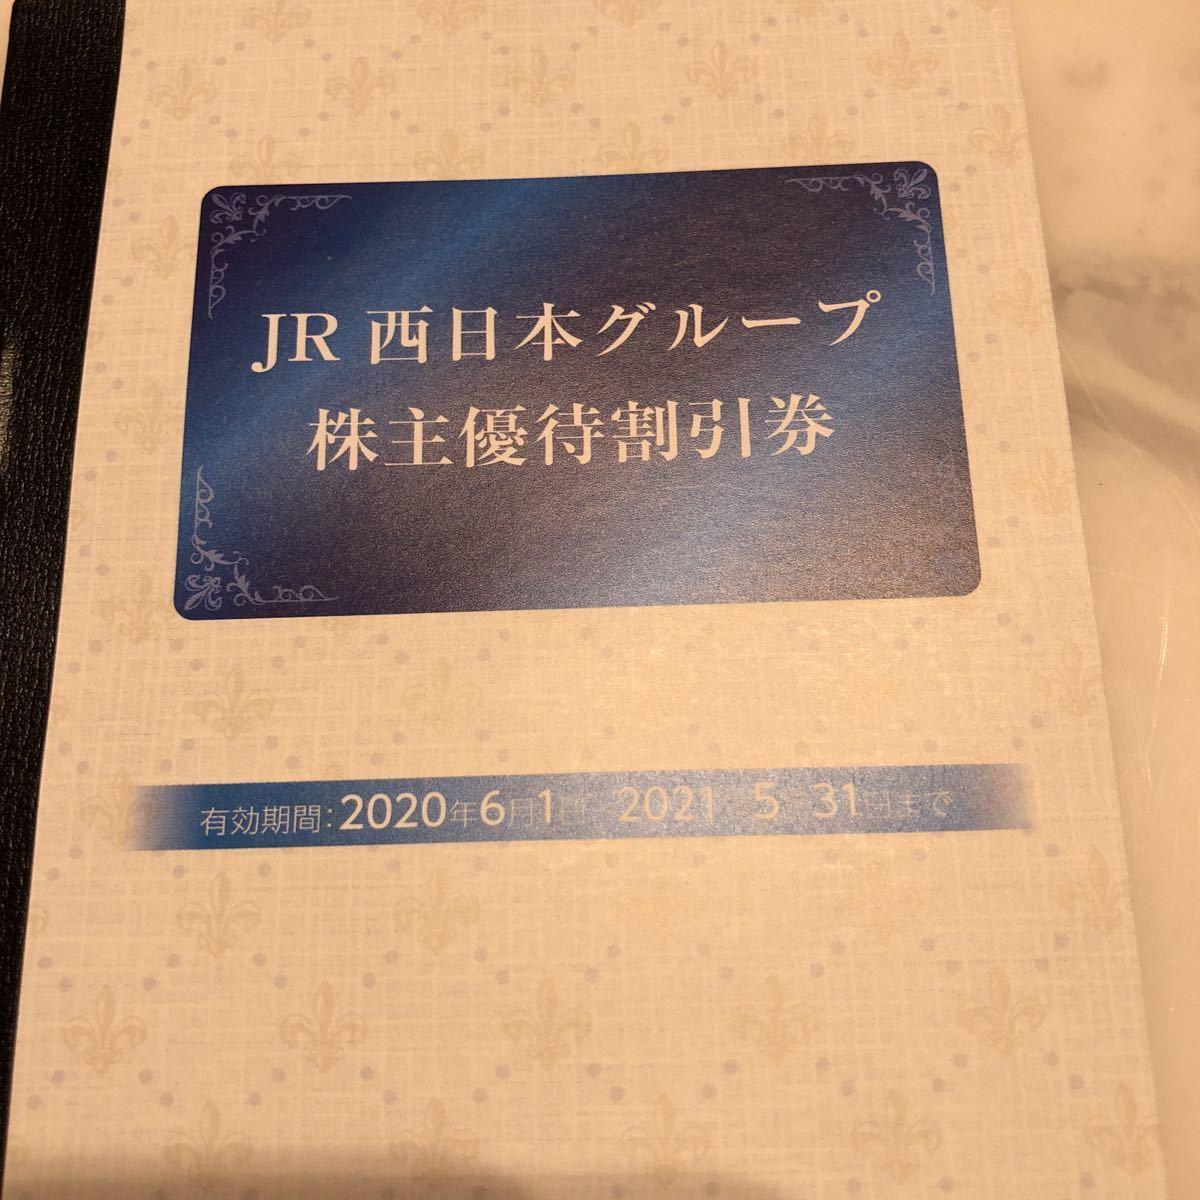 JR西日本 株主優待割引券2枚+優待割引券2021年5月31日まで_画像2